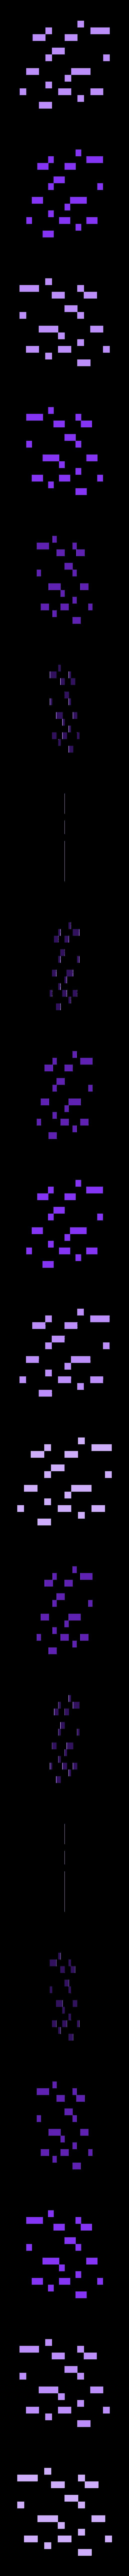 150mm_Dark_Face_Modifier.stl Download free STL file 8-Bit Minecraft Diamond Ore Lamp - Siri Enabled! • Design to 3D print, mkoistinen